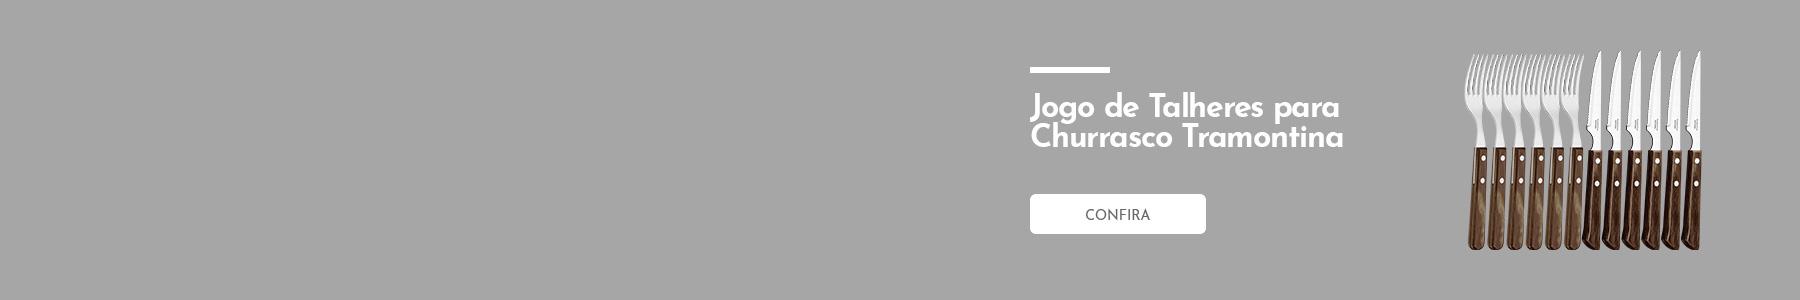 Carrossel Categoria - 3 banner